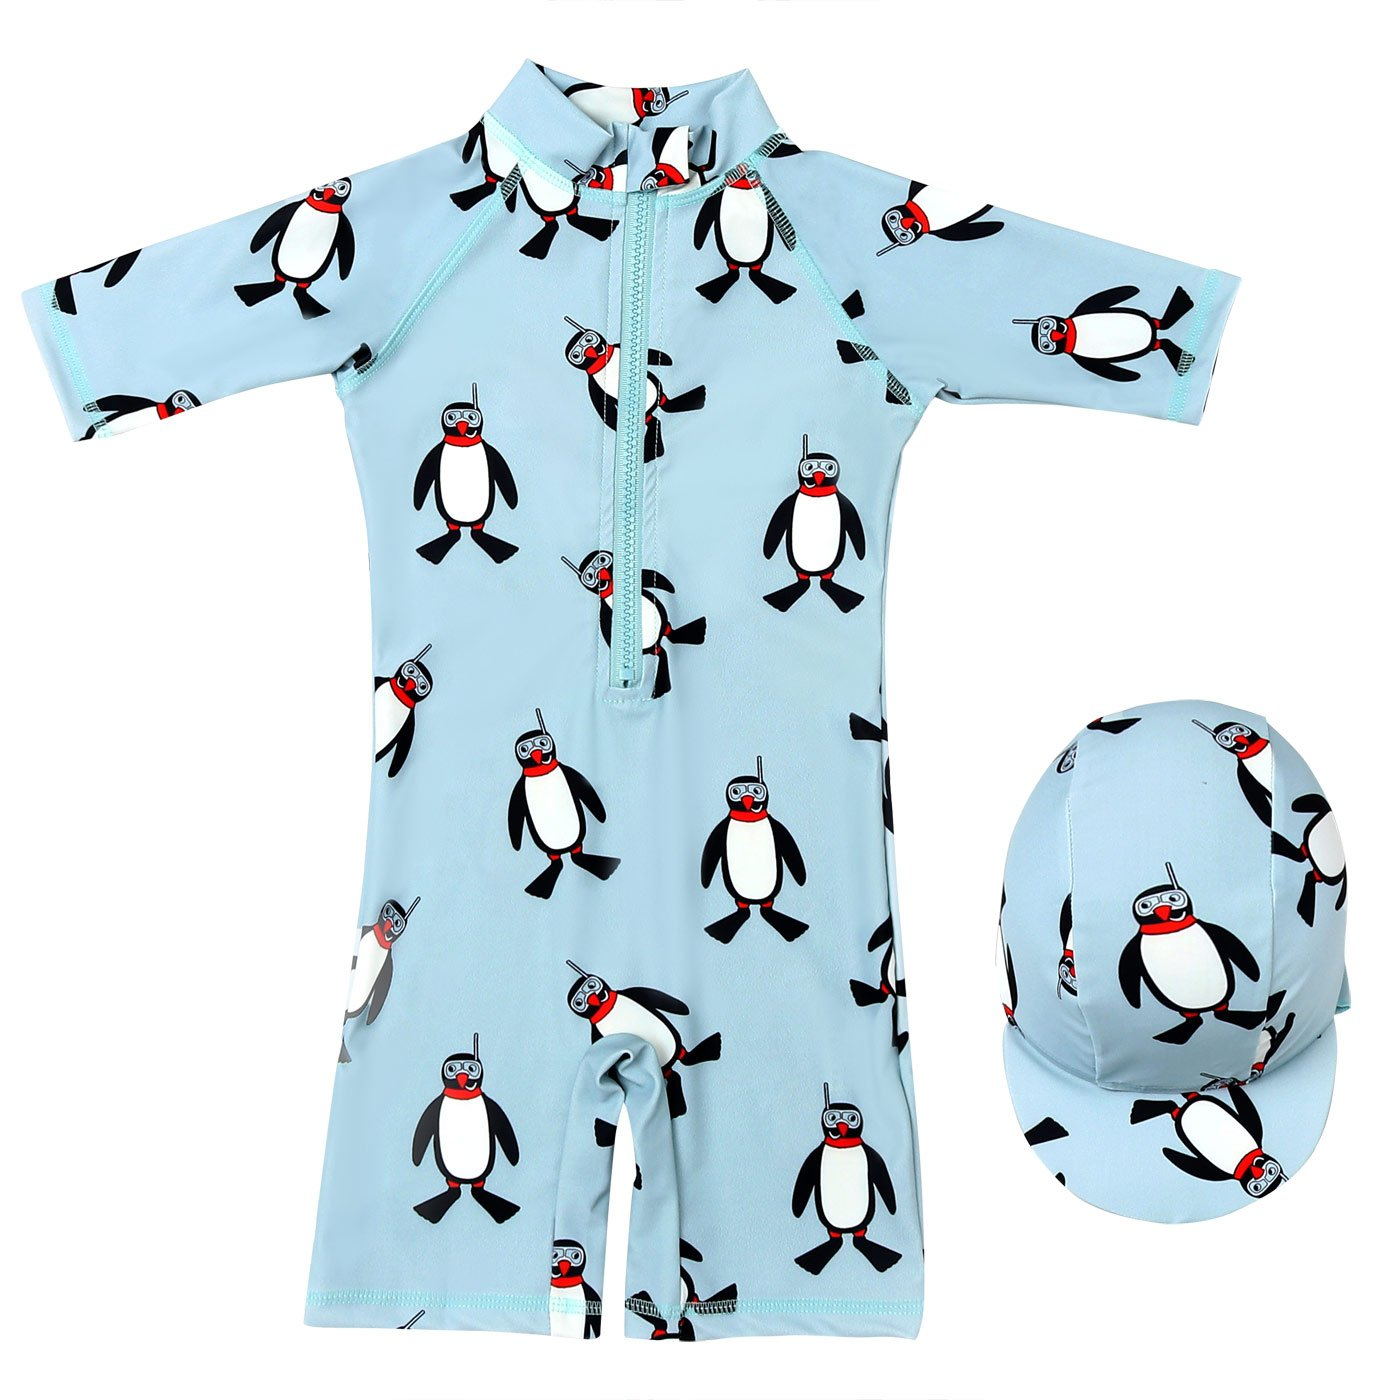 Aivtalk Baby Boys Rash Guard Swimsuit Sun Protection 3/4 Sleeve One Piece Swimwear